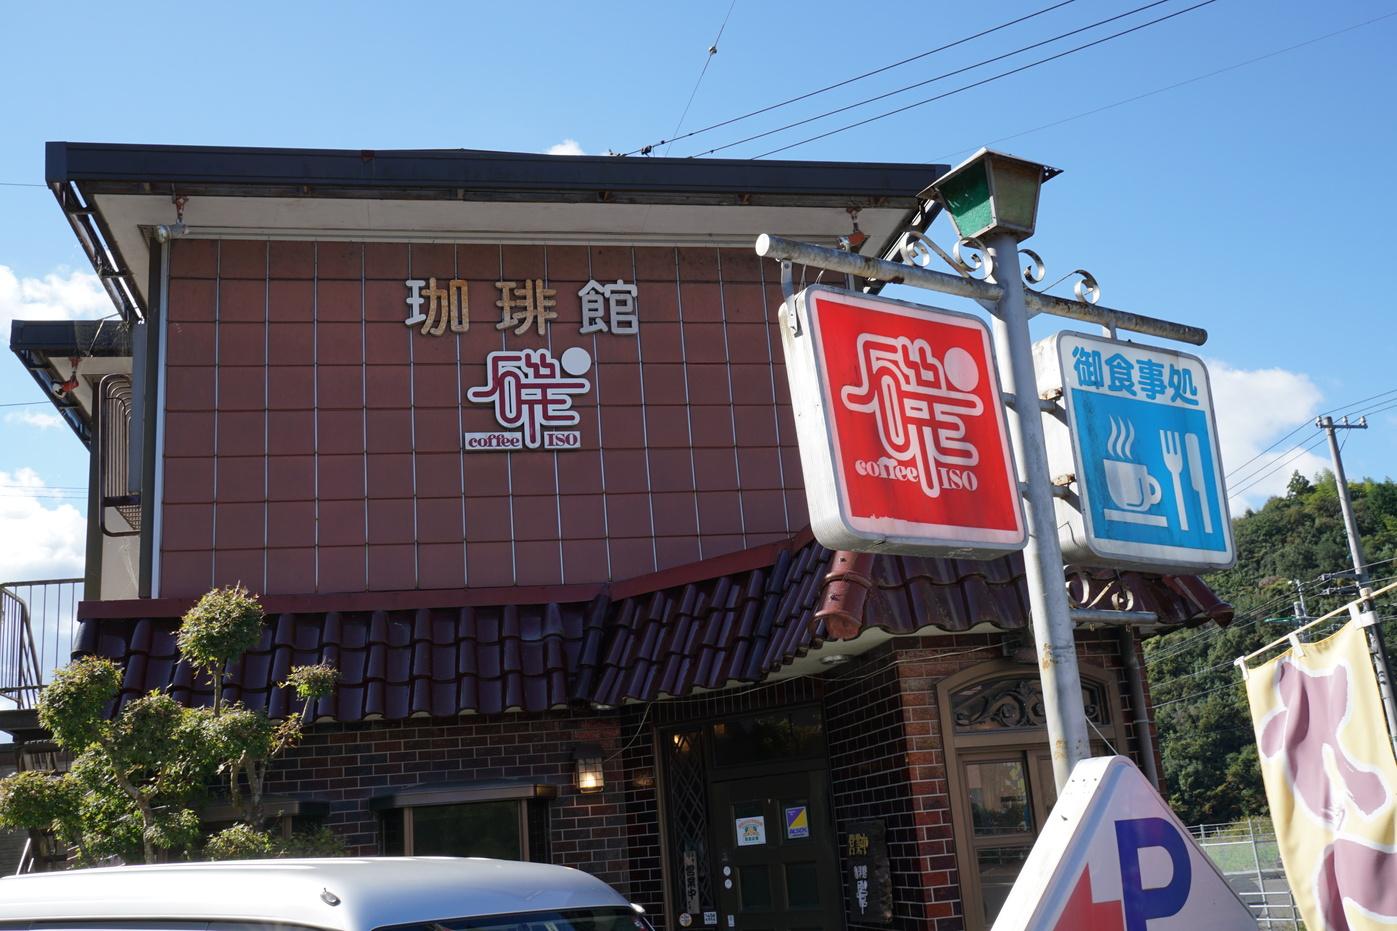 珈琲館 磯